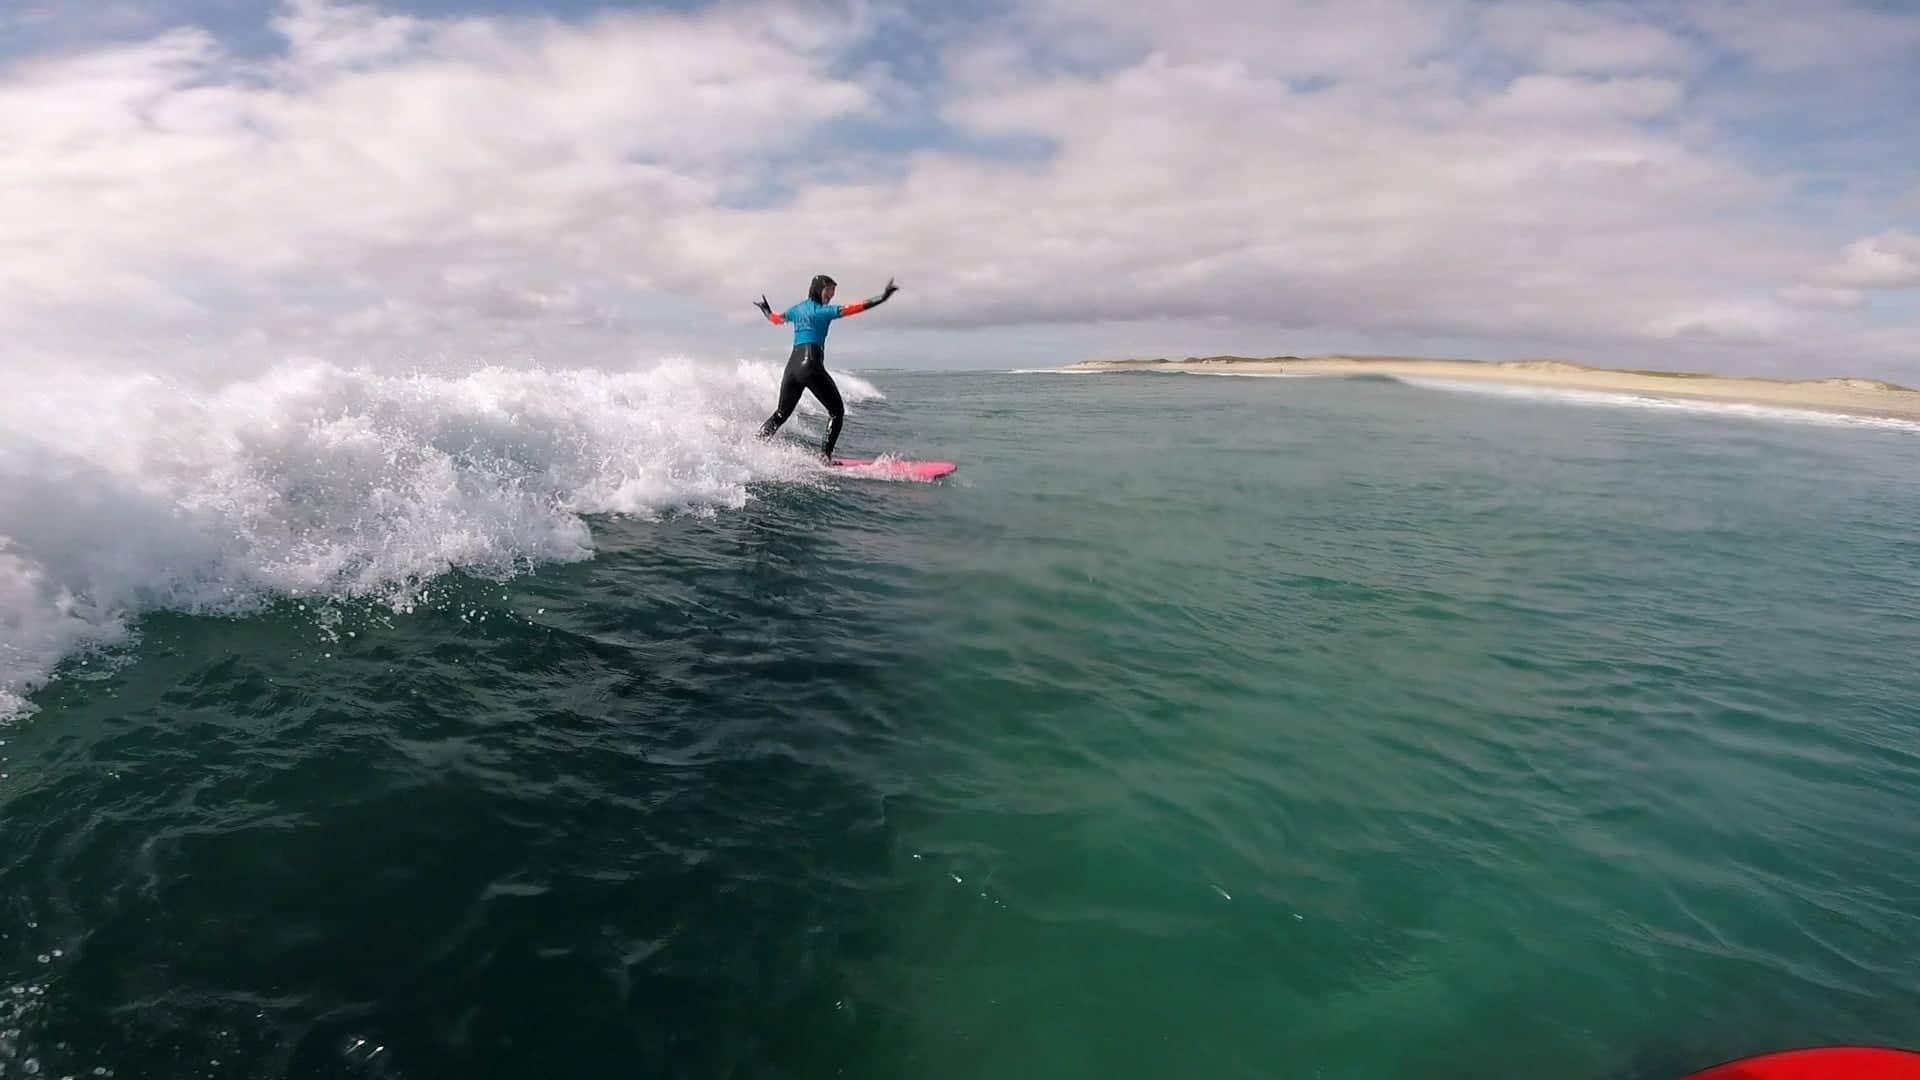 Tonn Nua surf school guy surfing